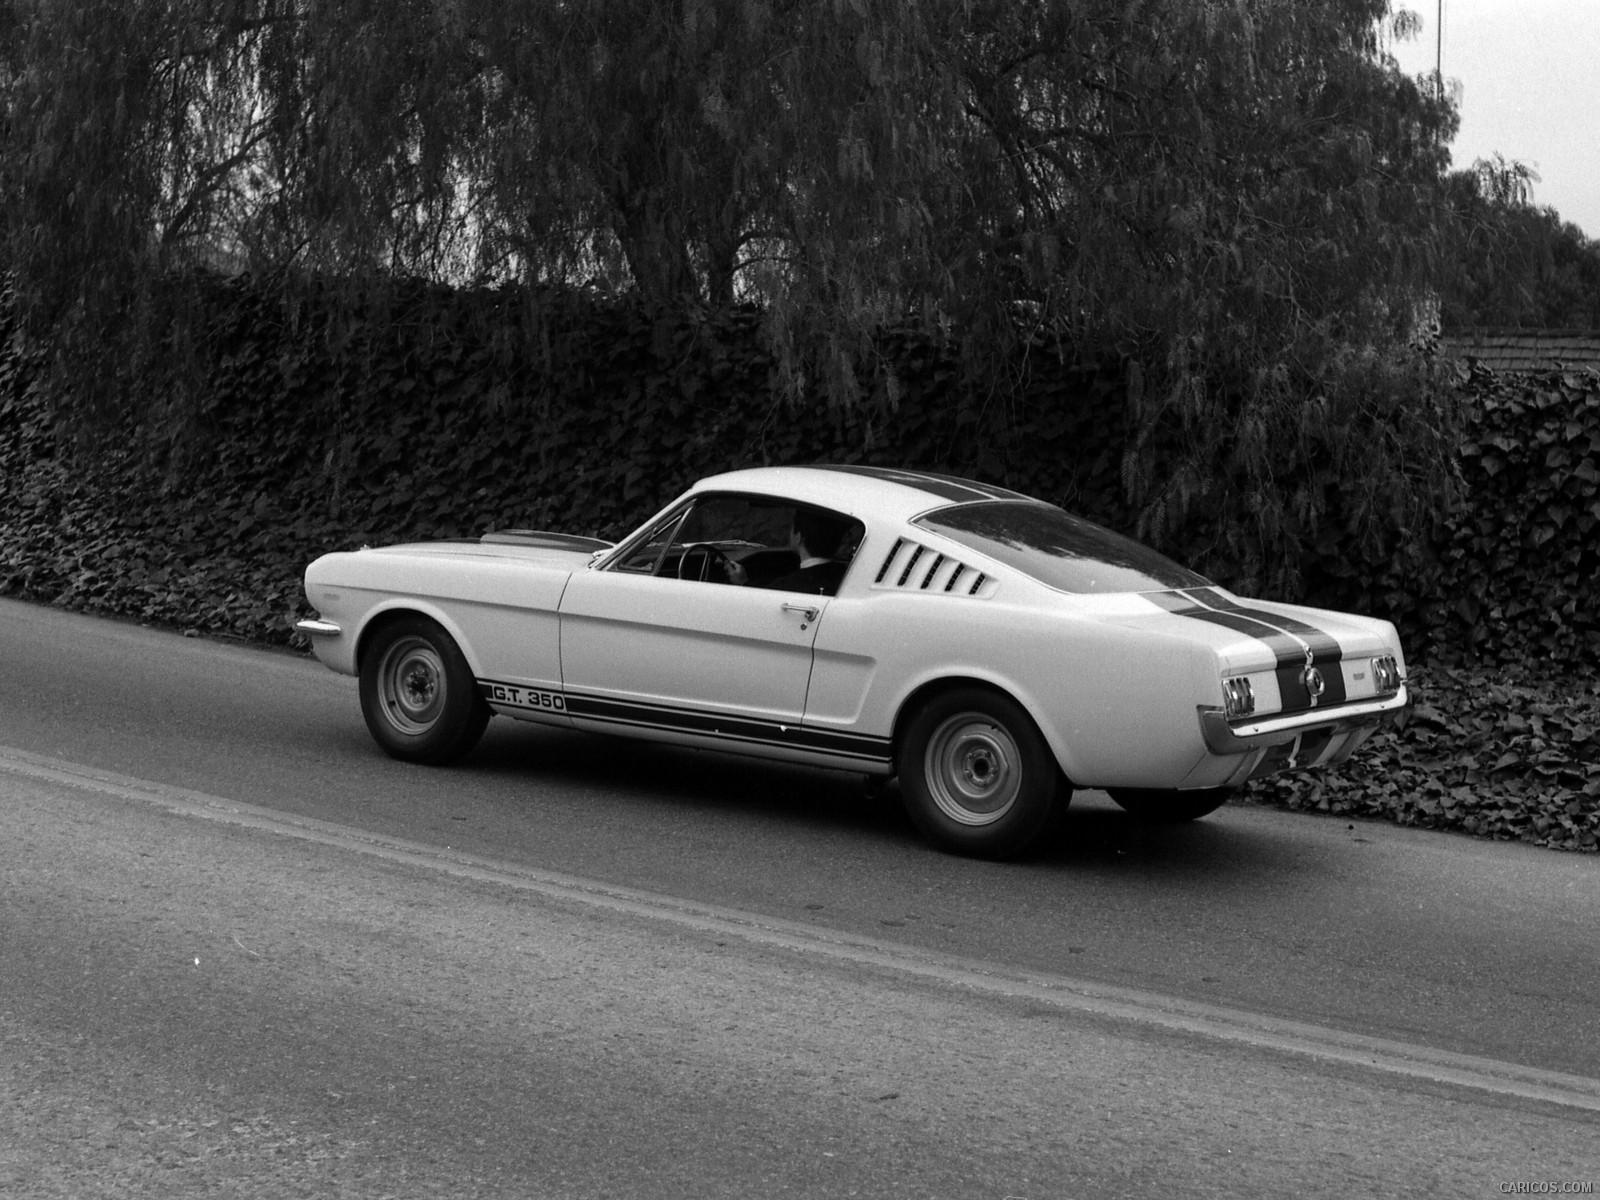 Ford Mustang Shelby GT350 4k duvarkağıdı